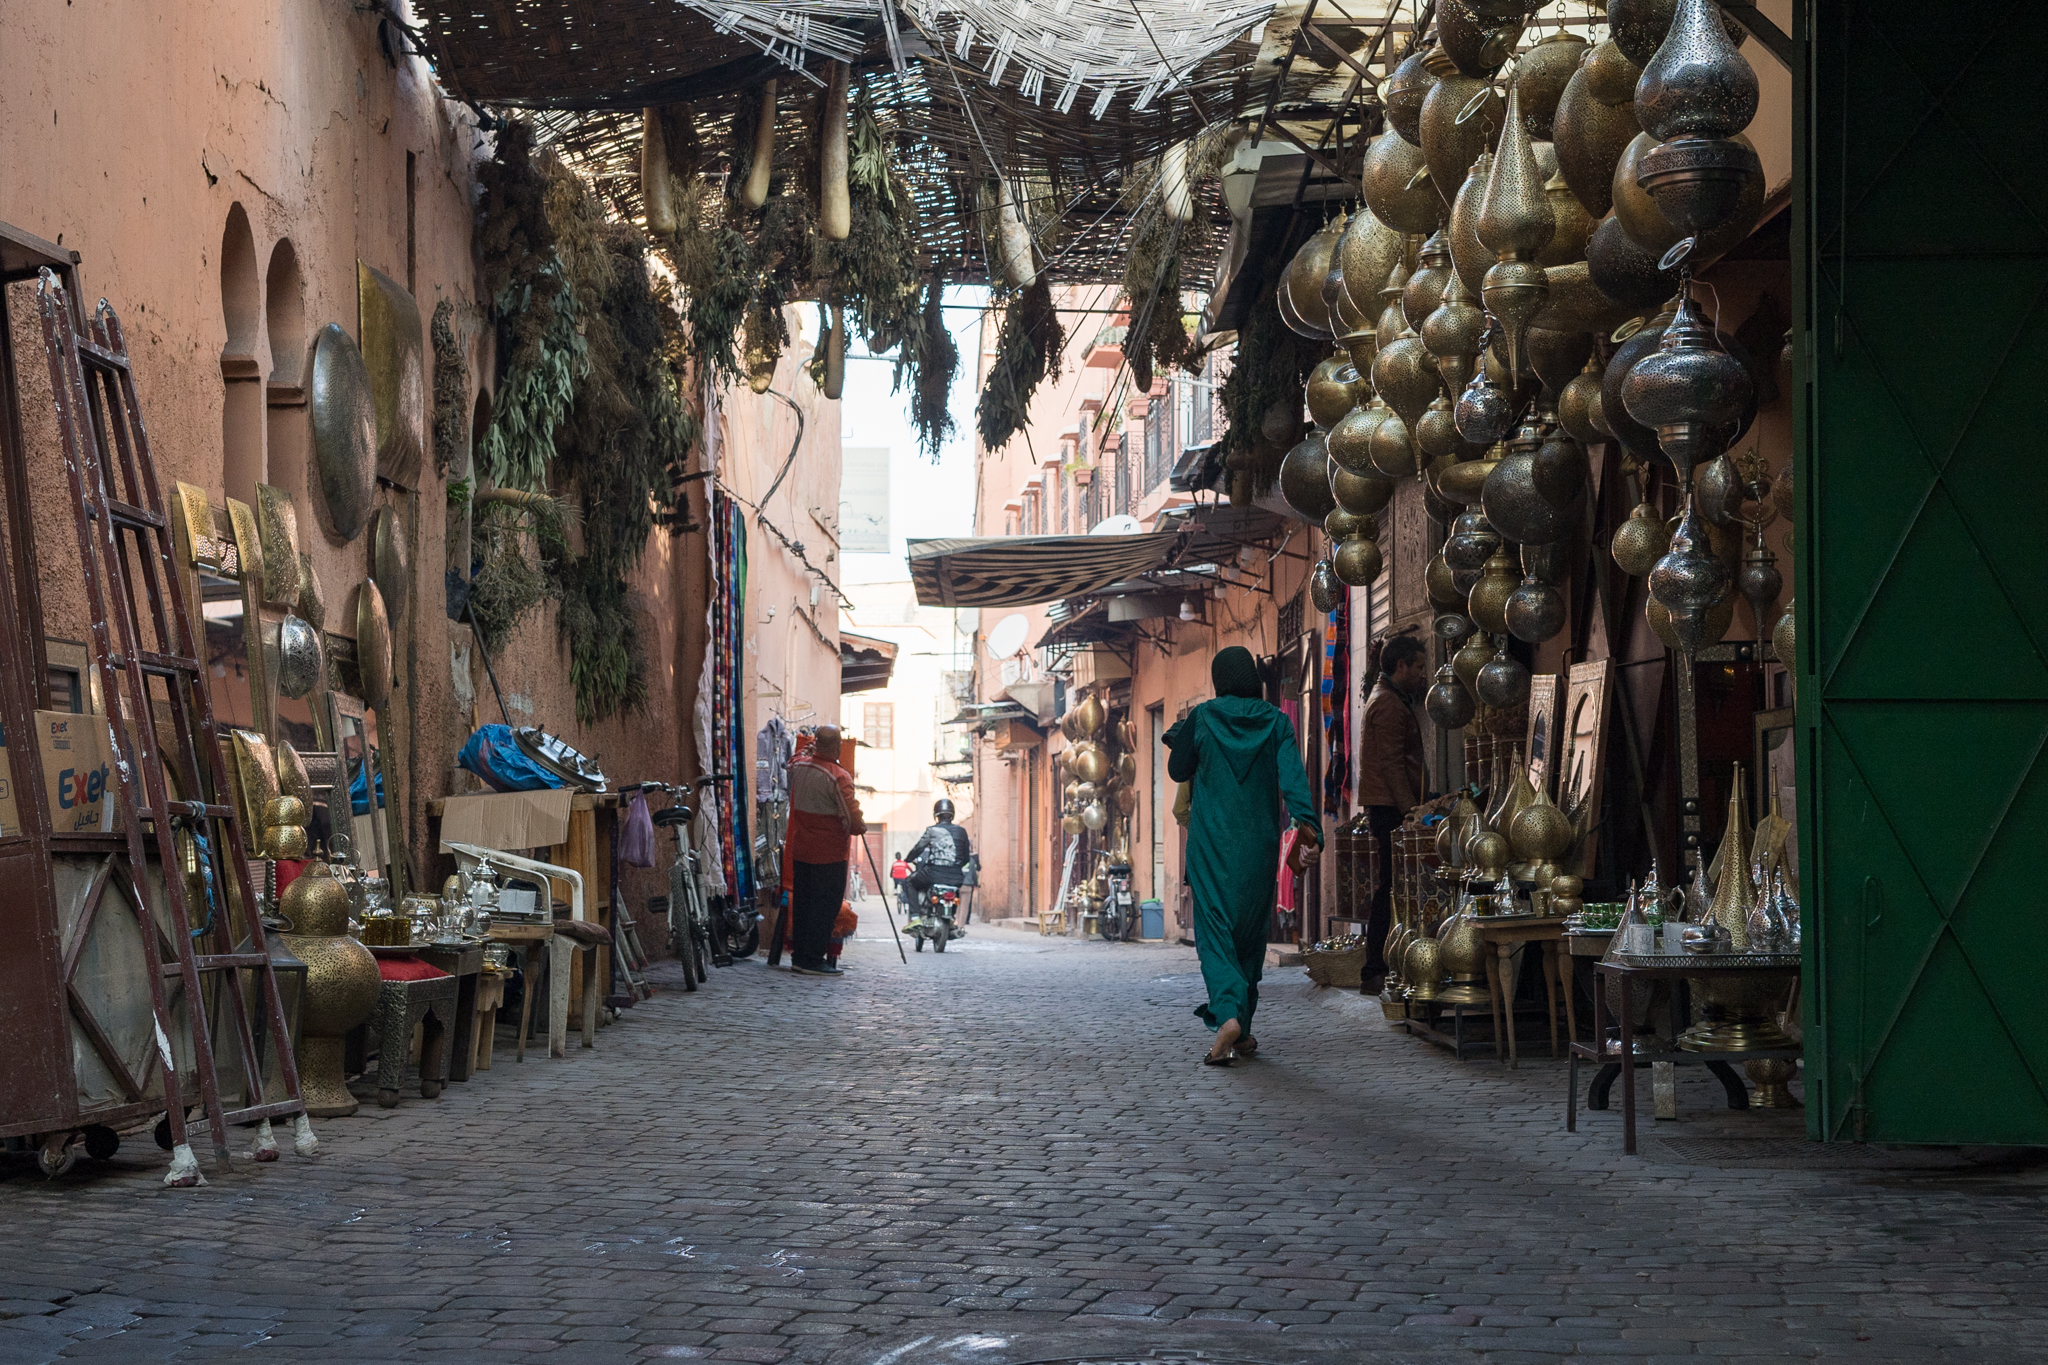 Morocco_Brenna Duncan-08985.jpg